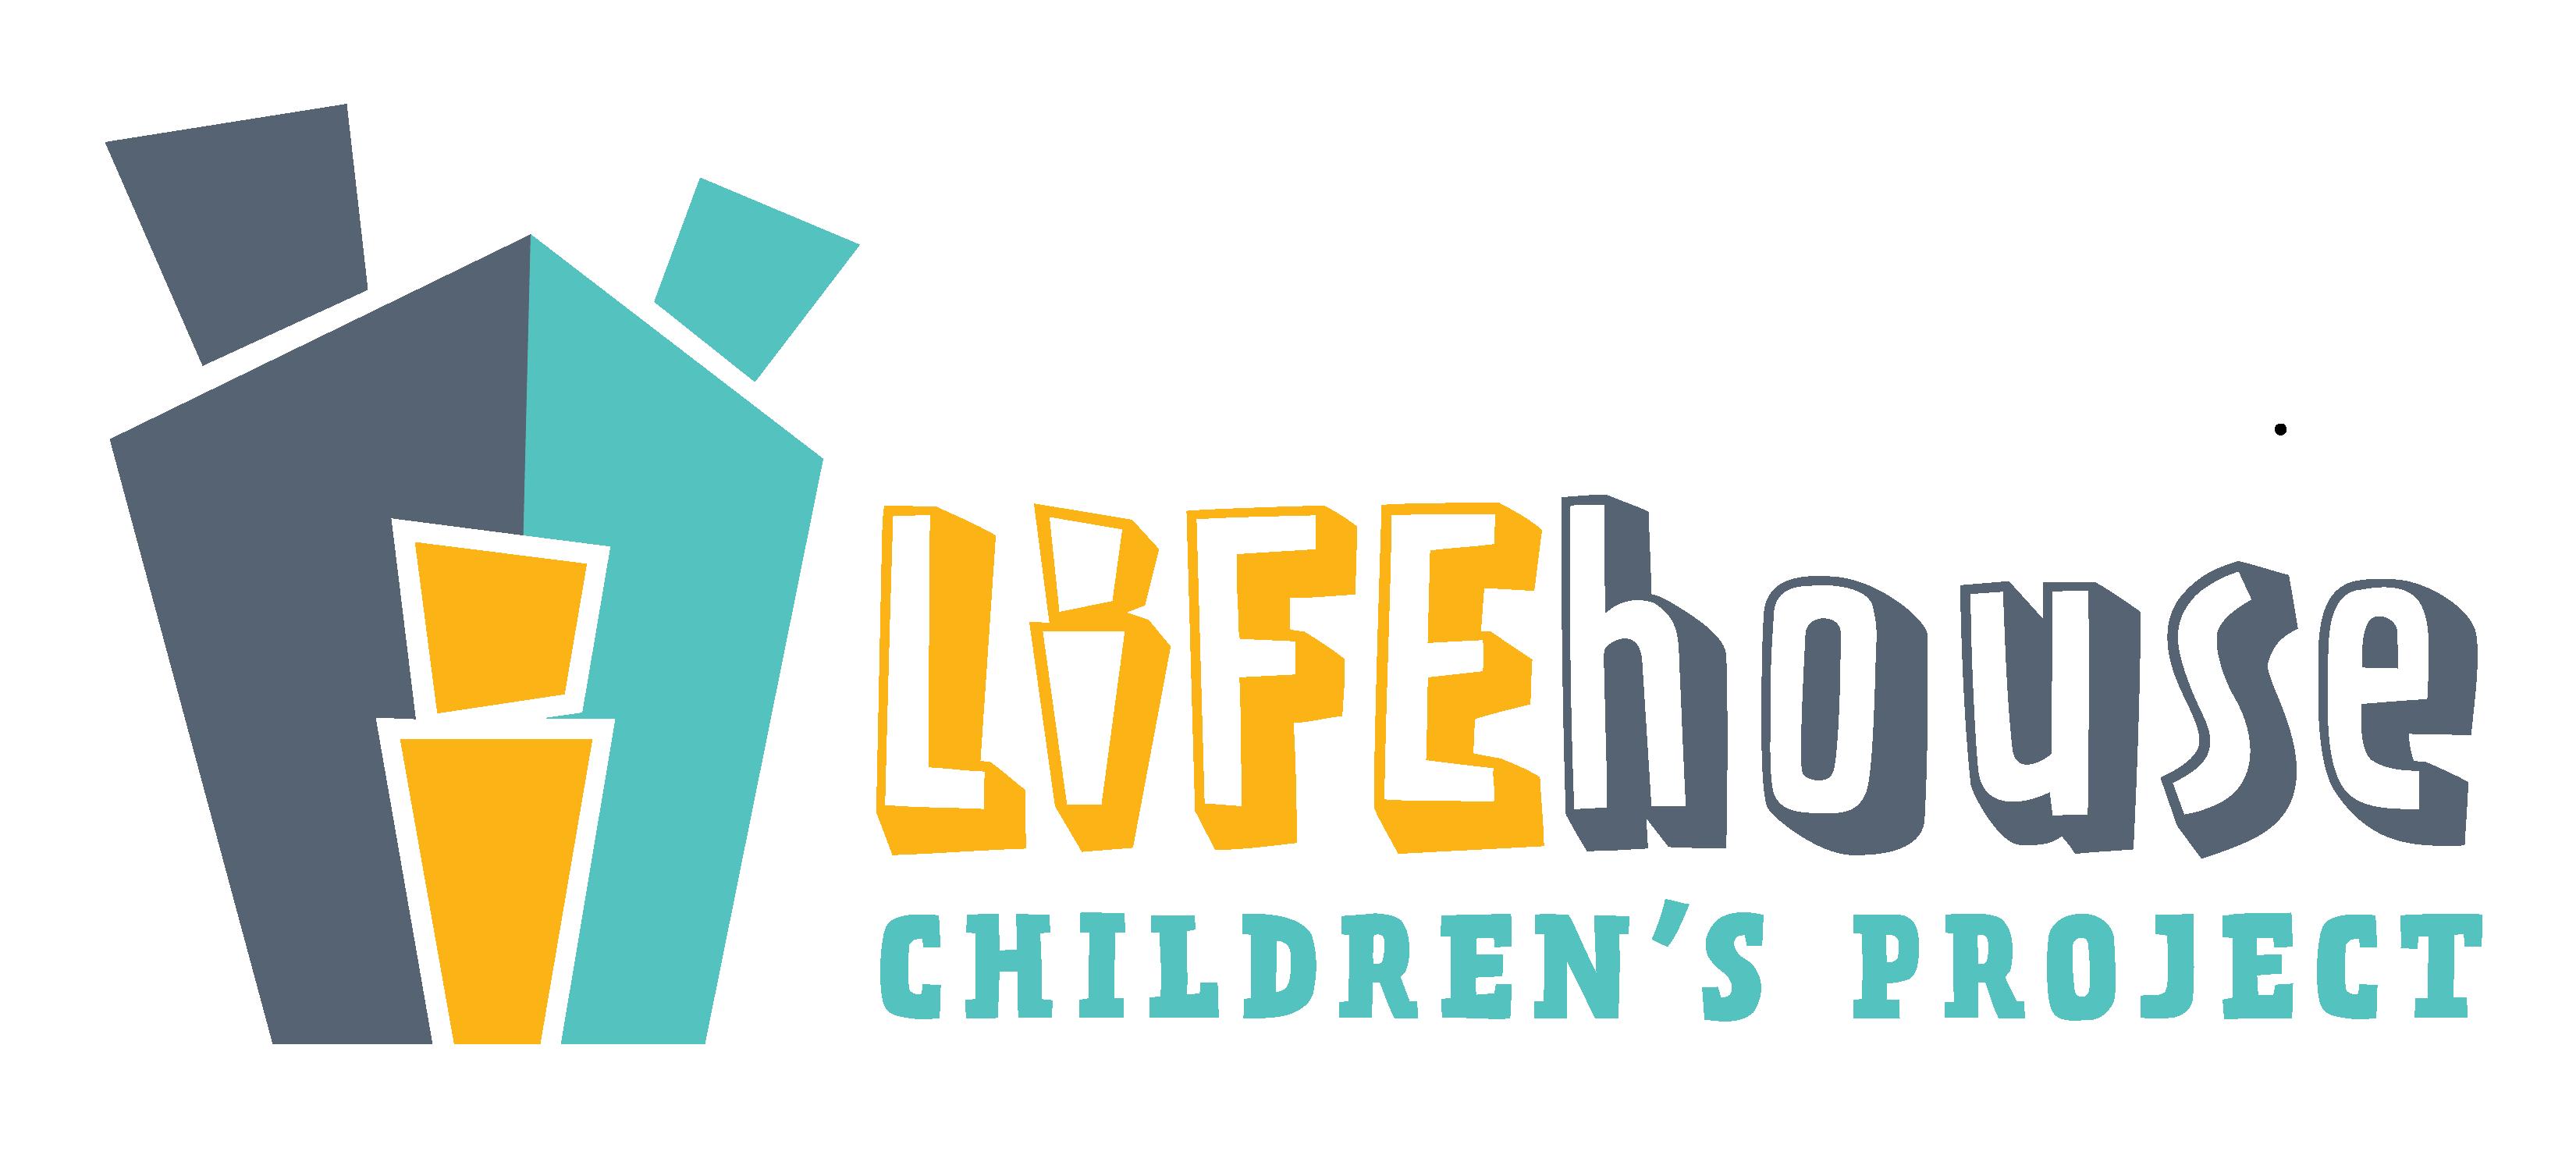 LIFEhouse Children's Project